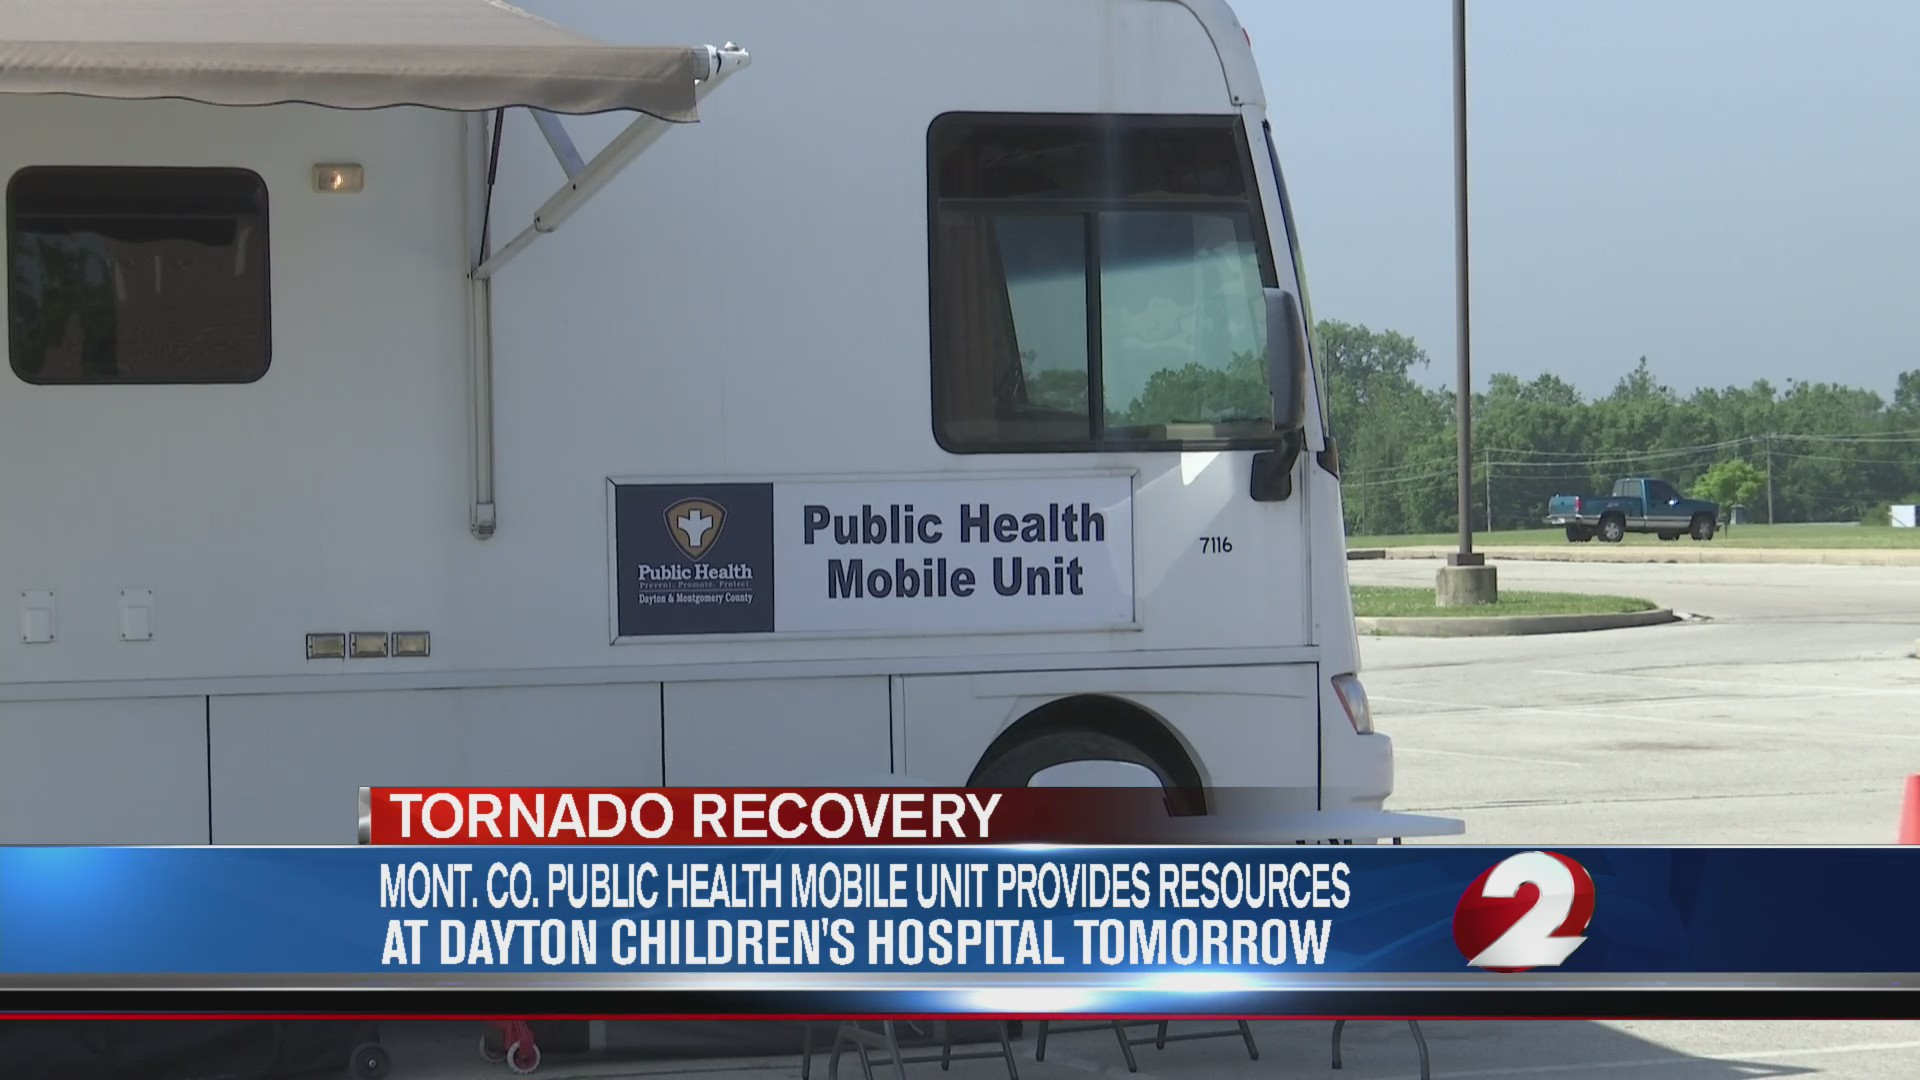 Public Health mobile unit provides resources for tornado